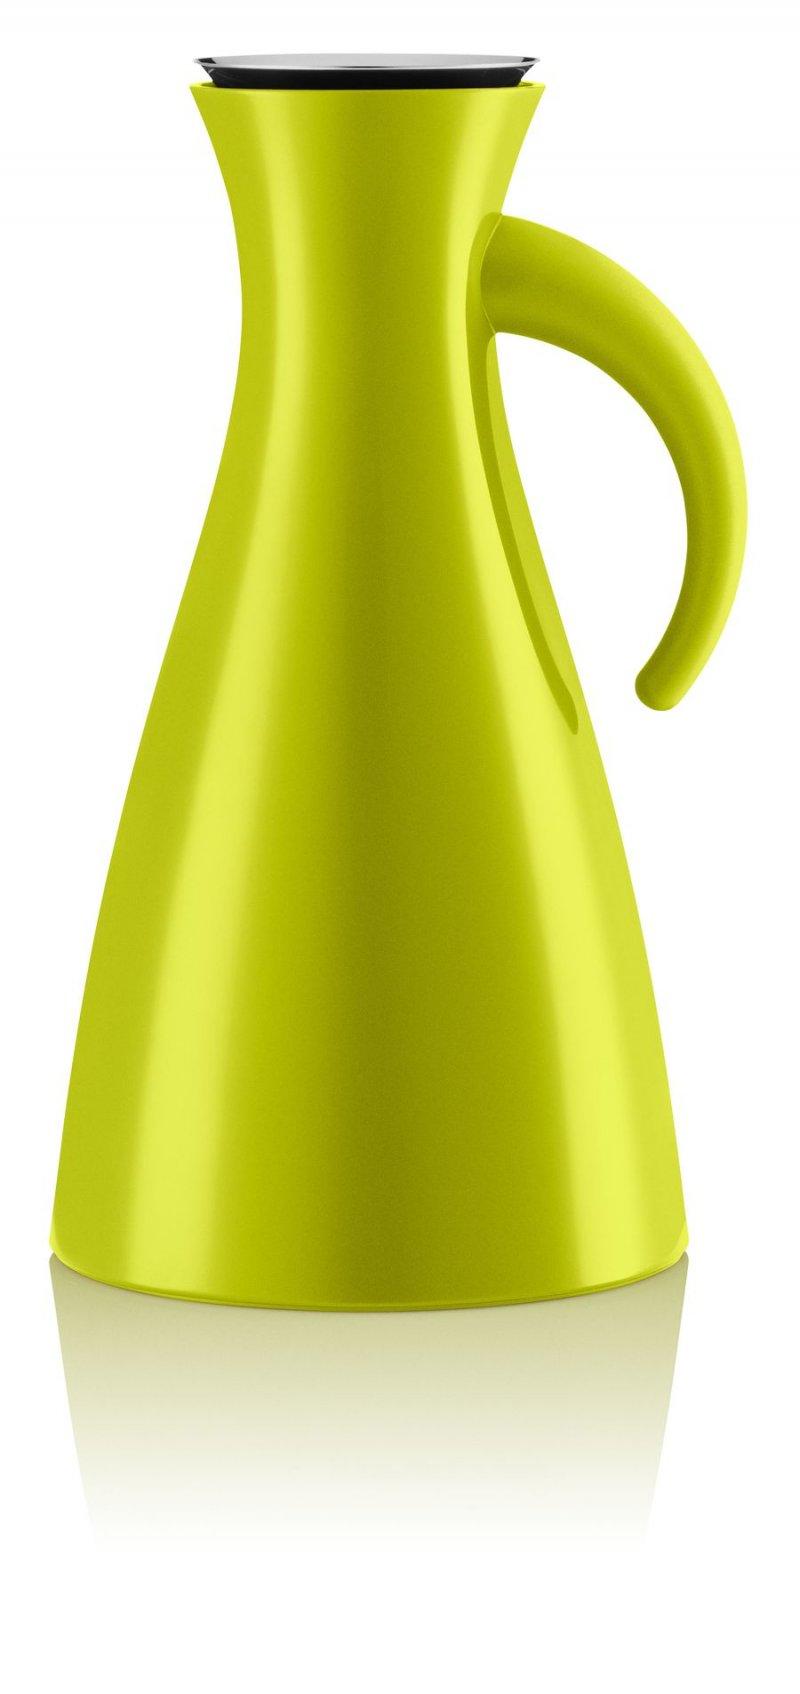 Image of   Eva Solo Termokande / Kaffekande - Lime